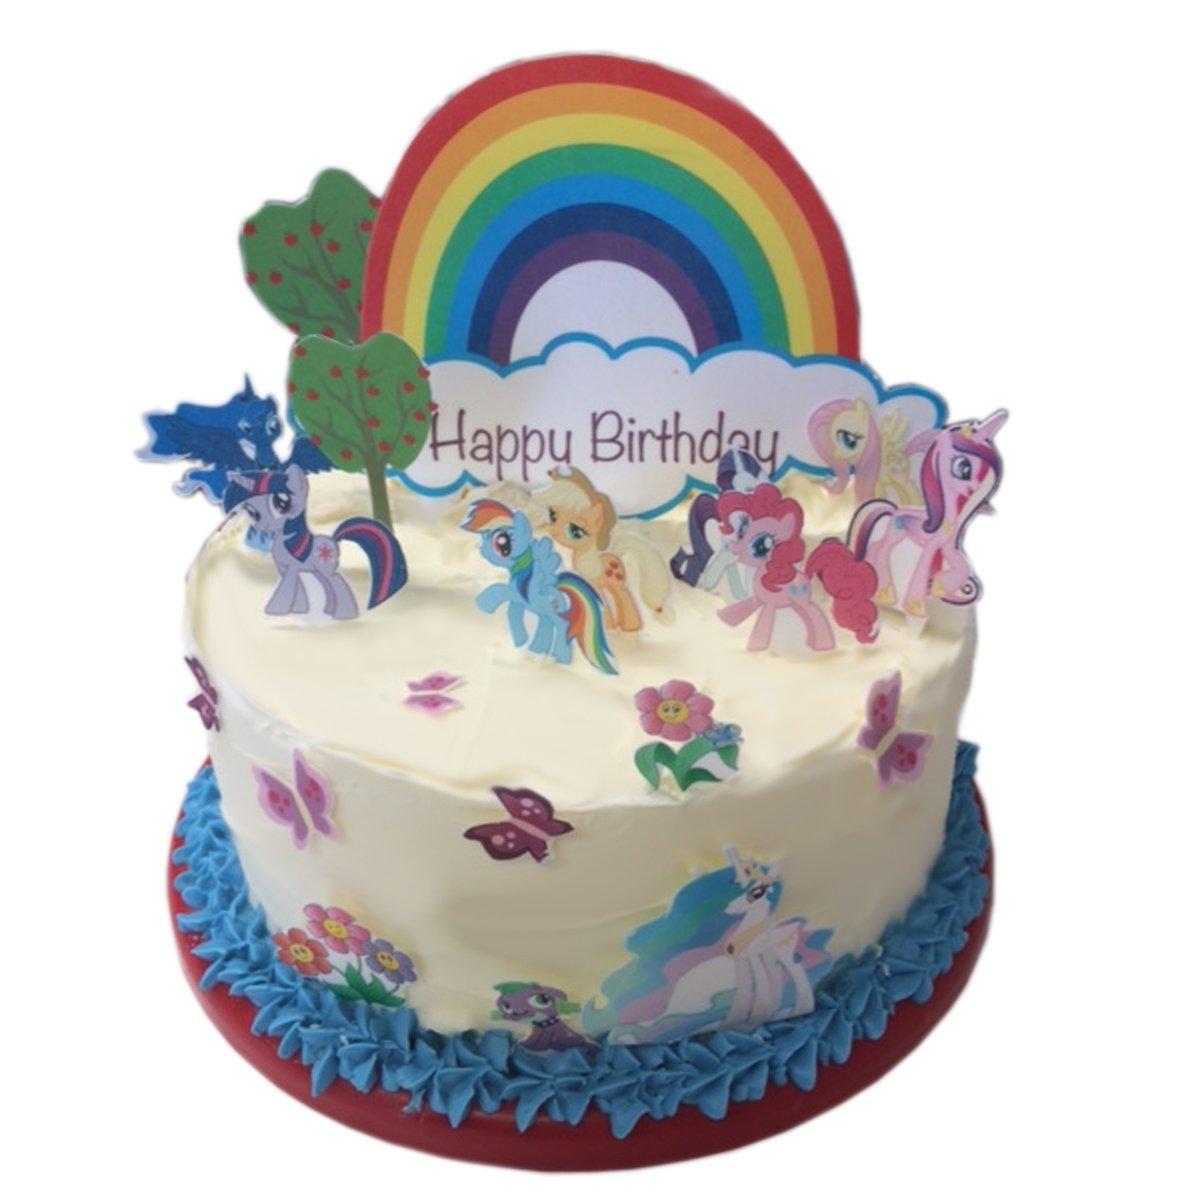 Groovy My Little Pony Happy Birthday Scene Edible Wafer Paper Cake Funny Birthday Cards Online Alyptdamsfinfo